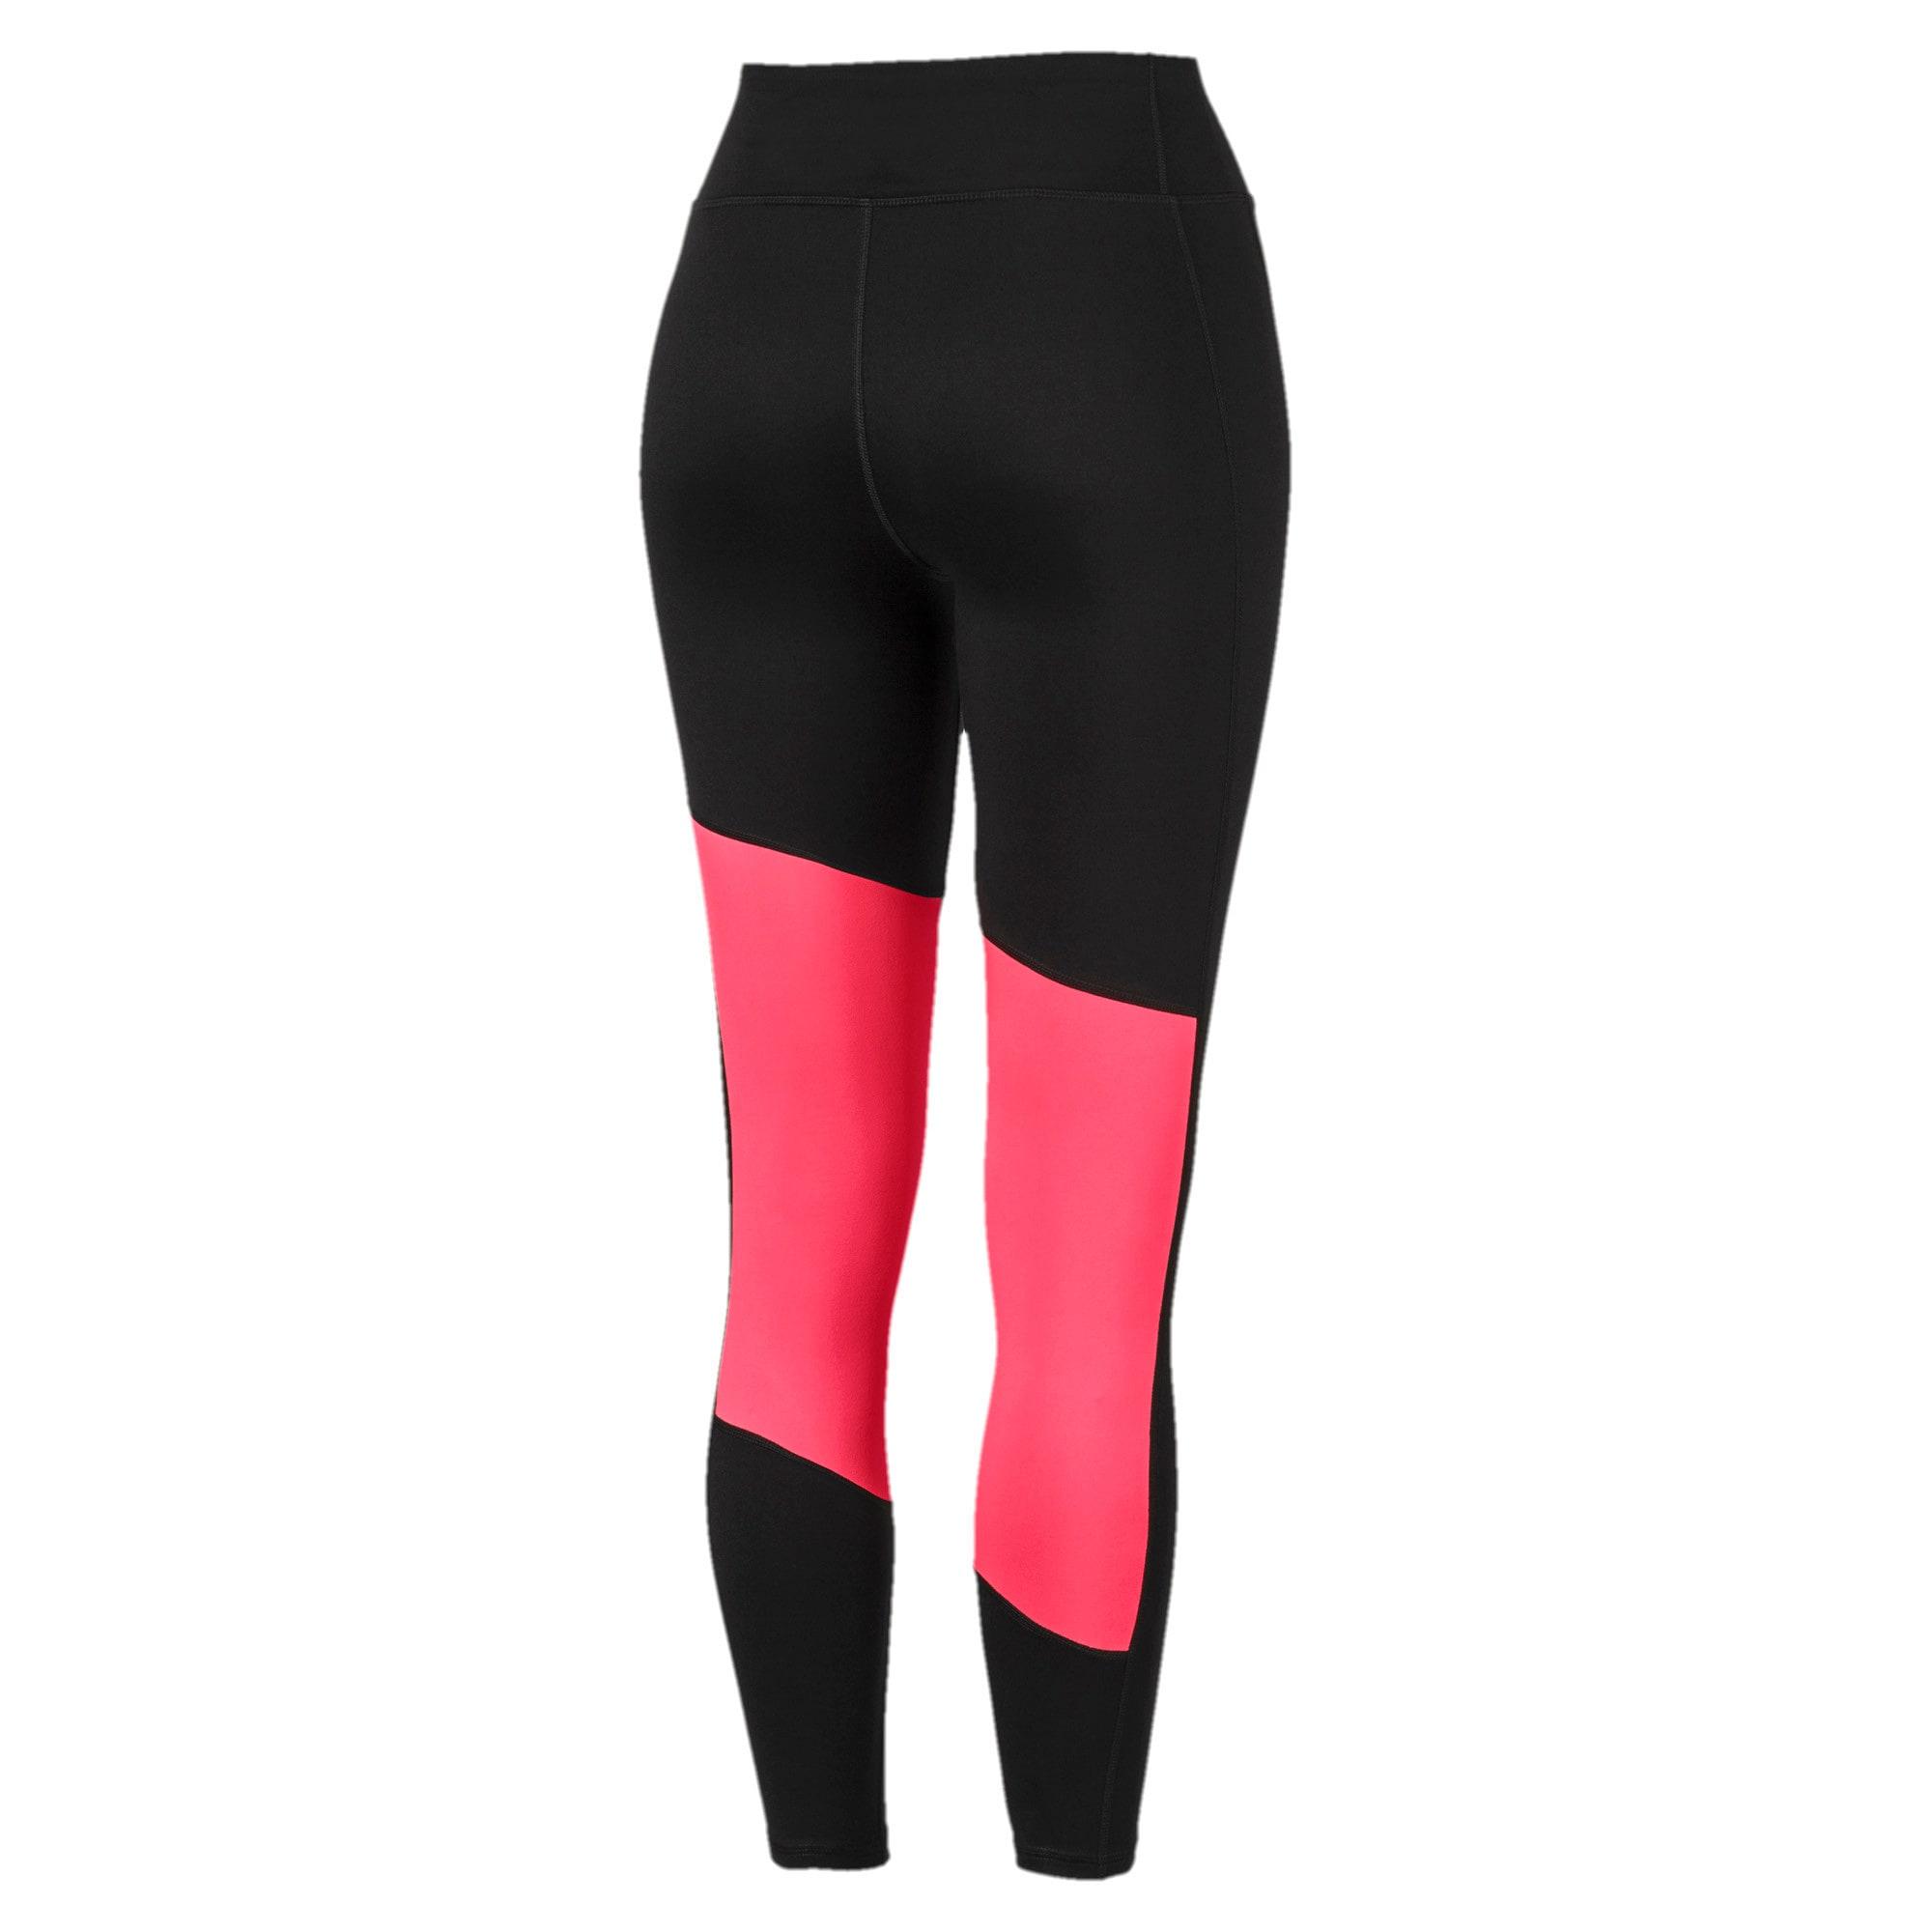 Thumbnail 5 of Logo 7/8 Graphic Women's Training Leggings, Puma Black-Pink Alert, medium-IND